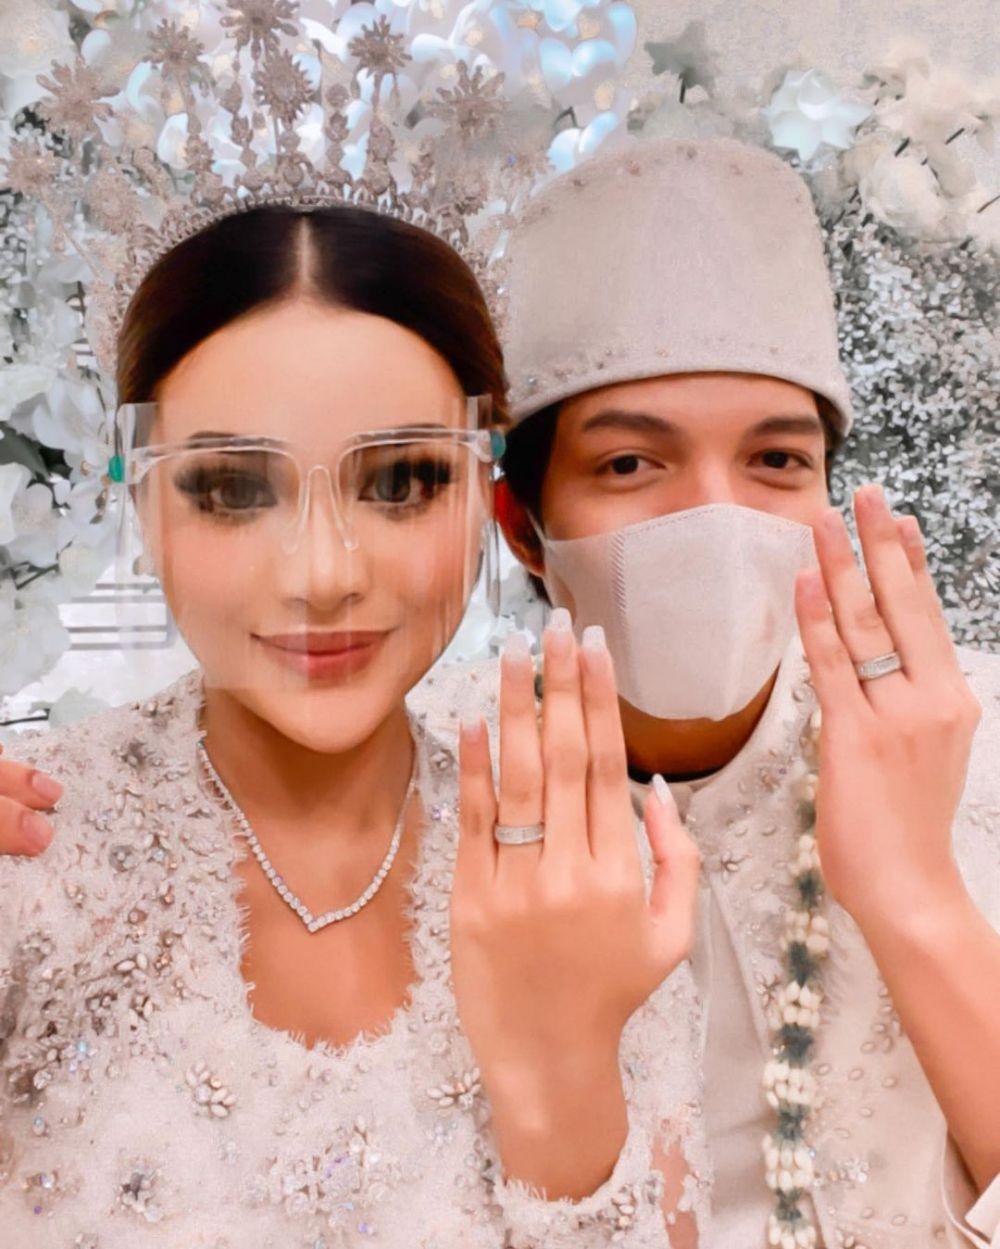 Momen selfie 9 seleb yang nikah di 2021 © 2021 brilio.net